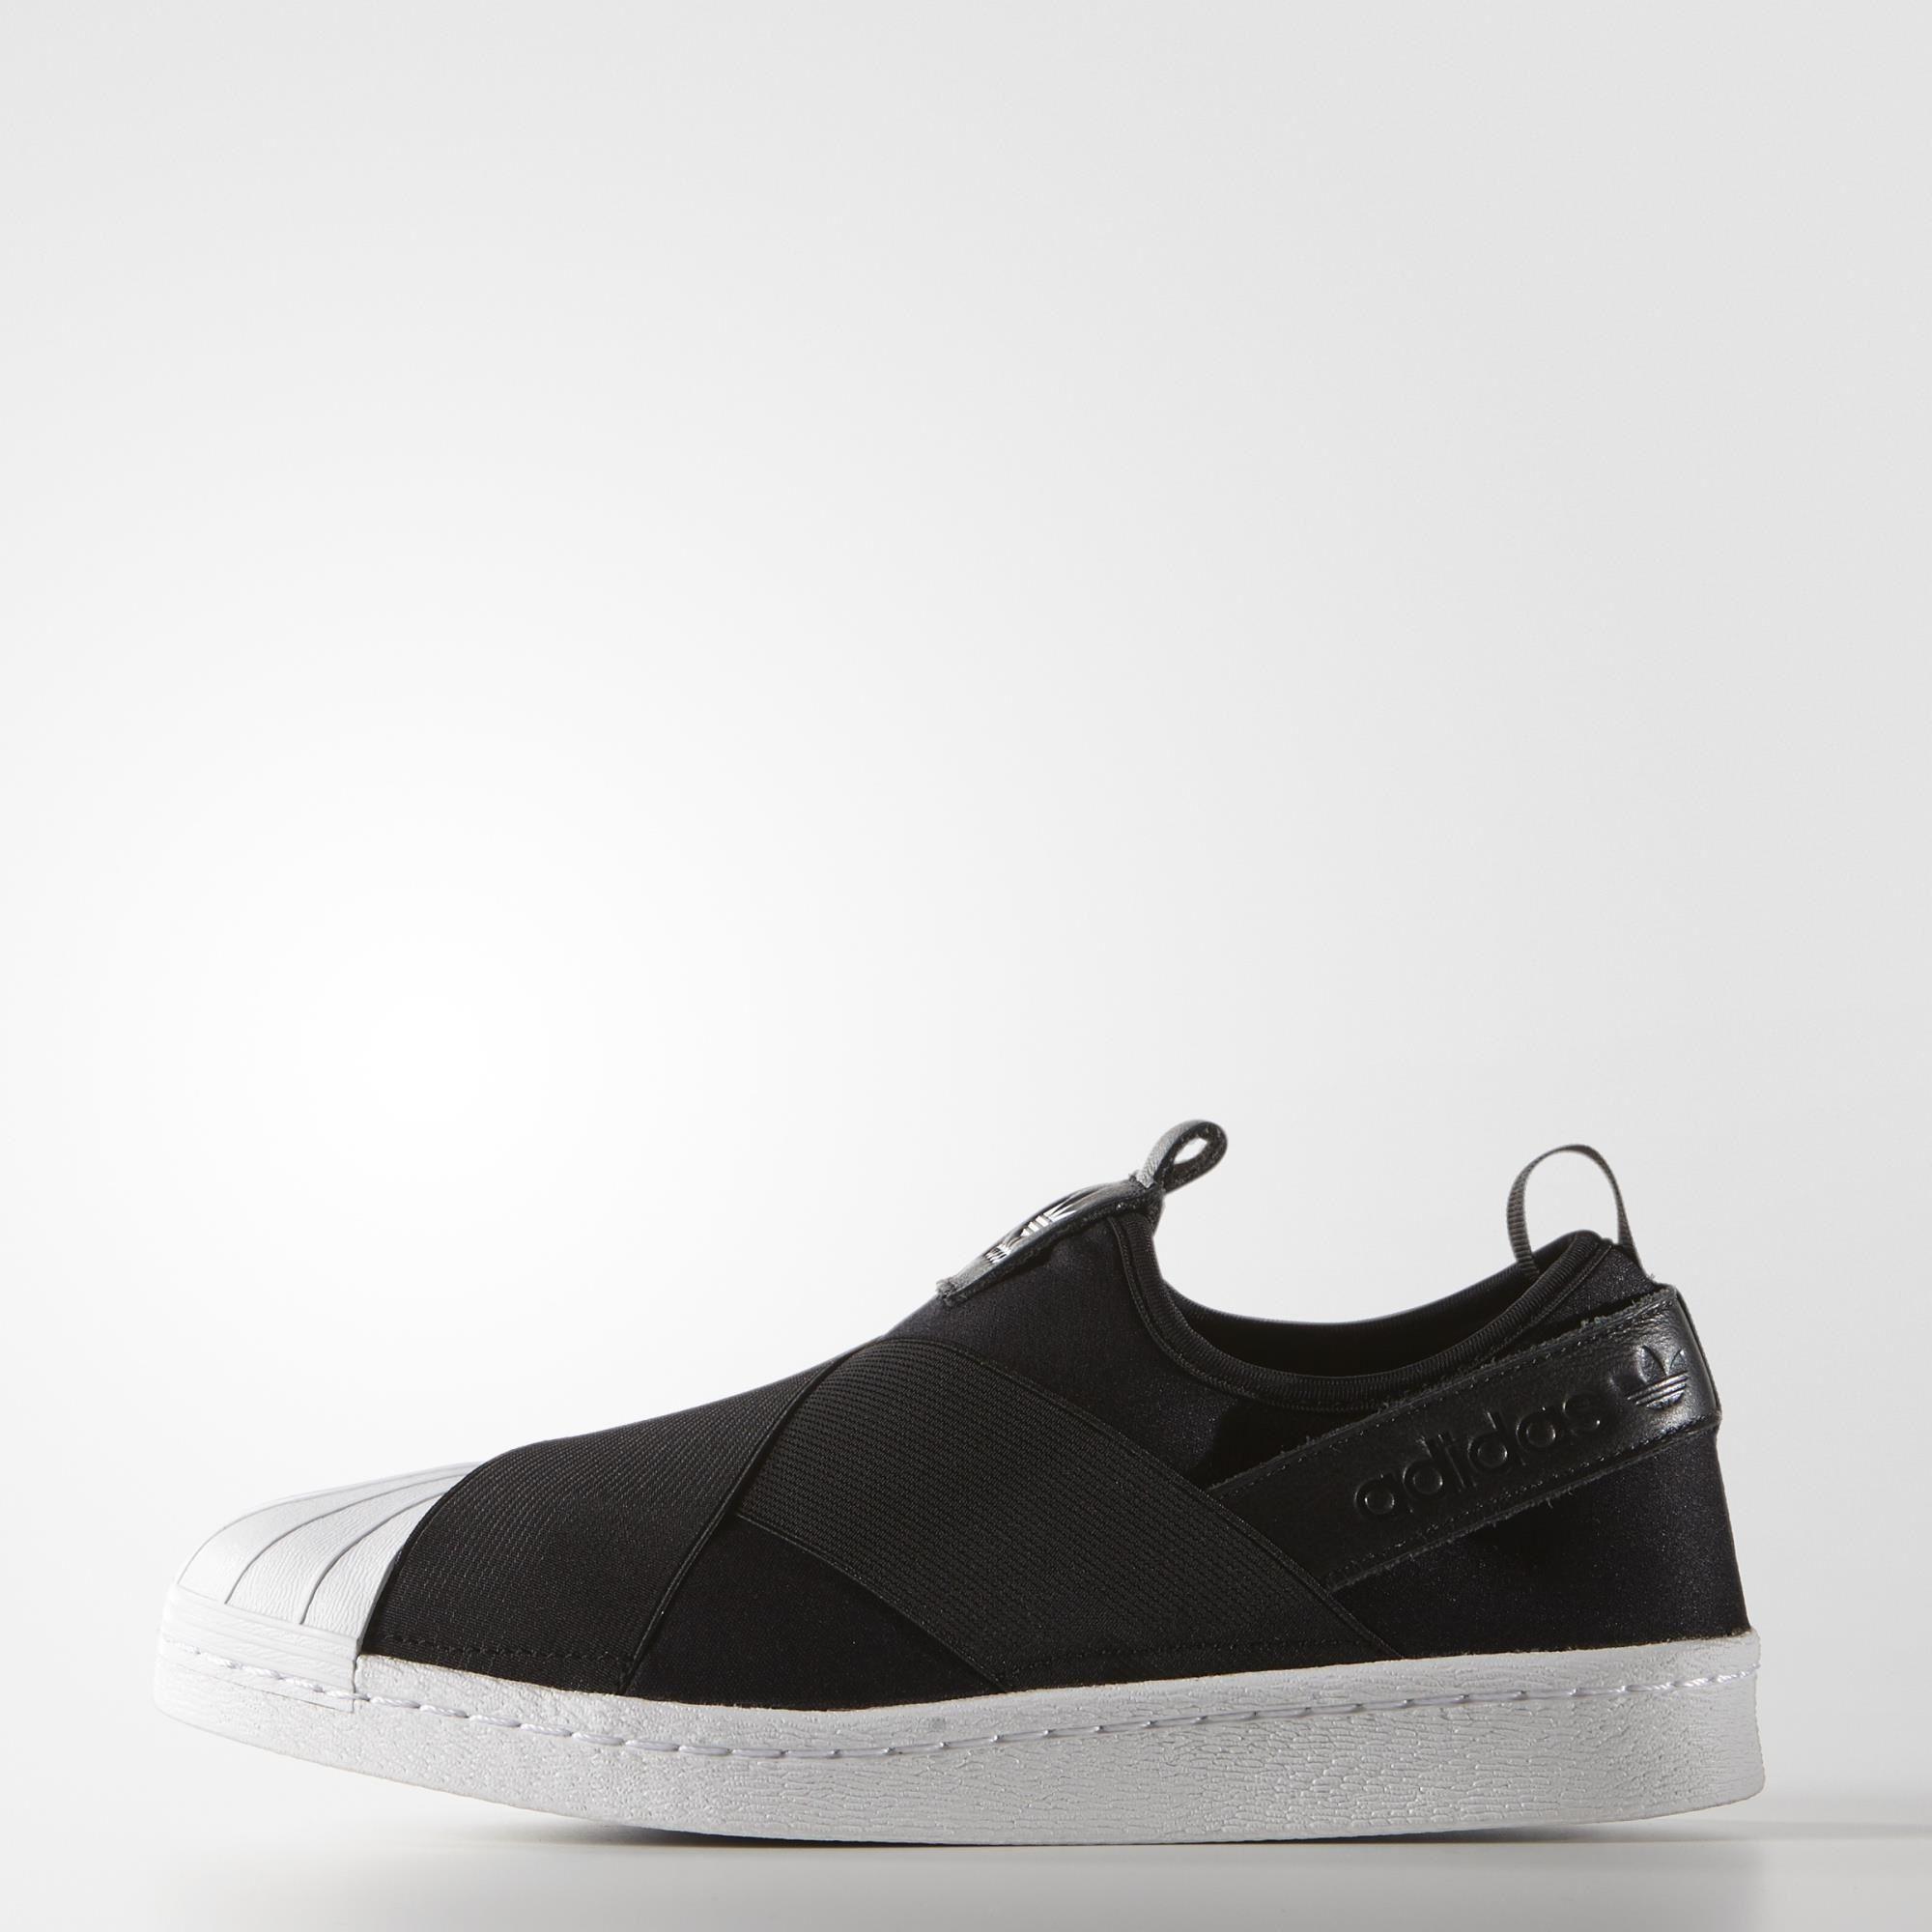 buy popular 9c3b0 9760b adidas Zapatillas Originals Superstar Slip On W - Negro   adidas Argentina